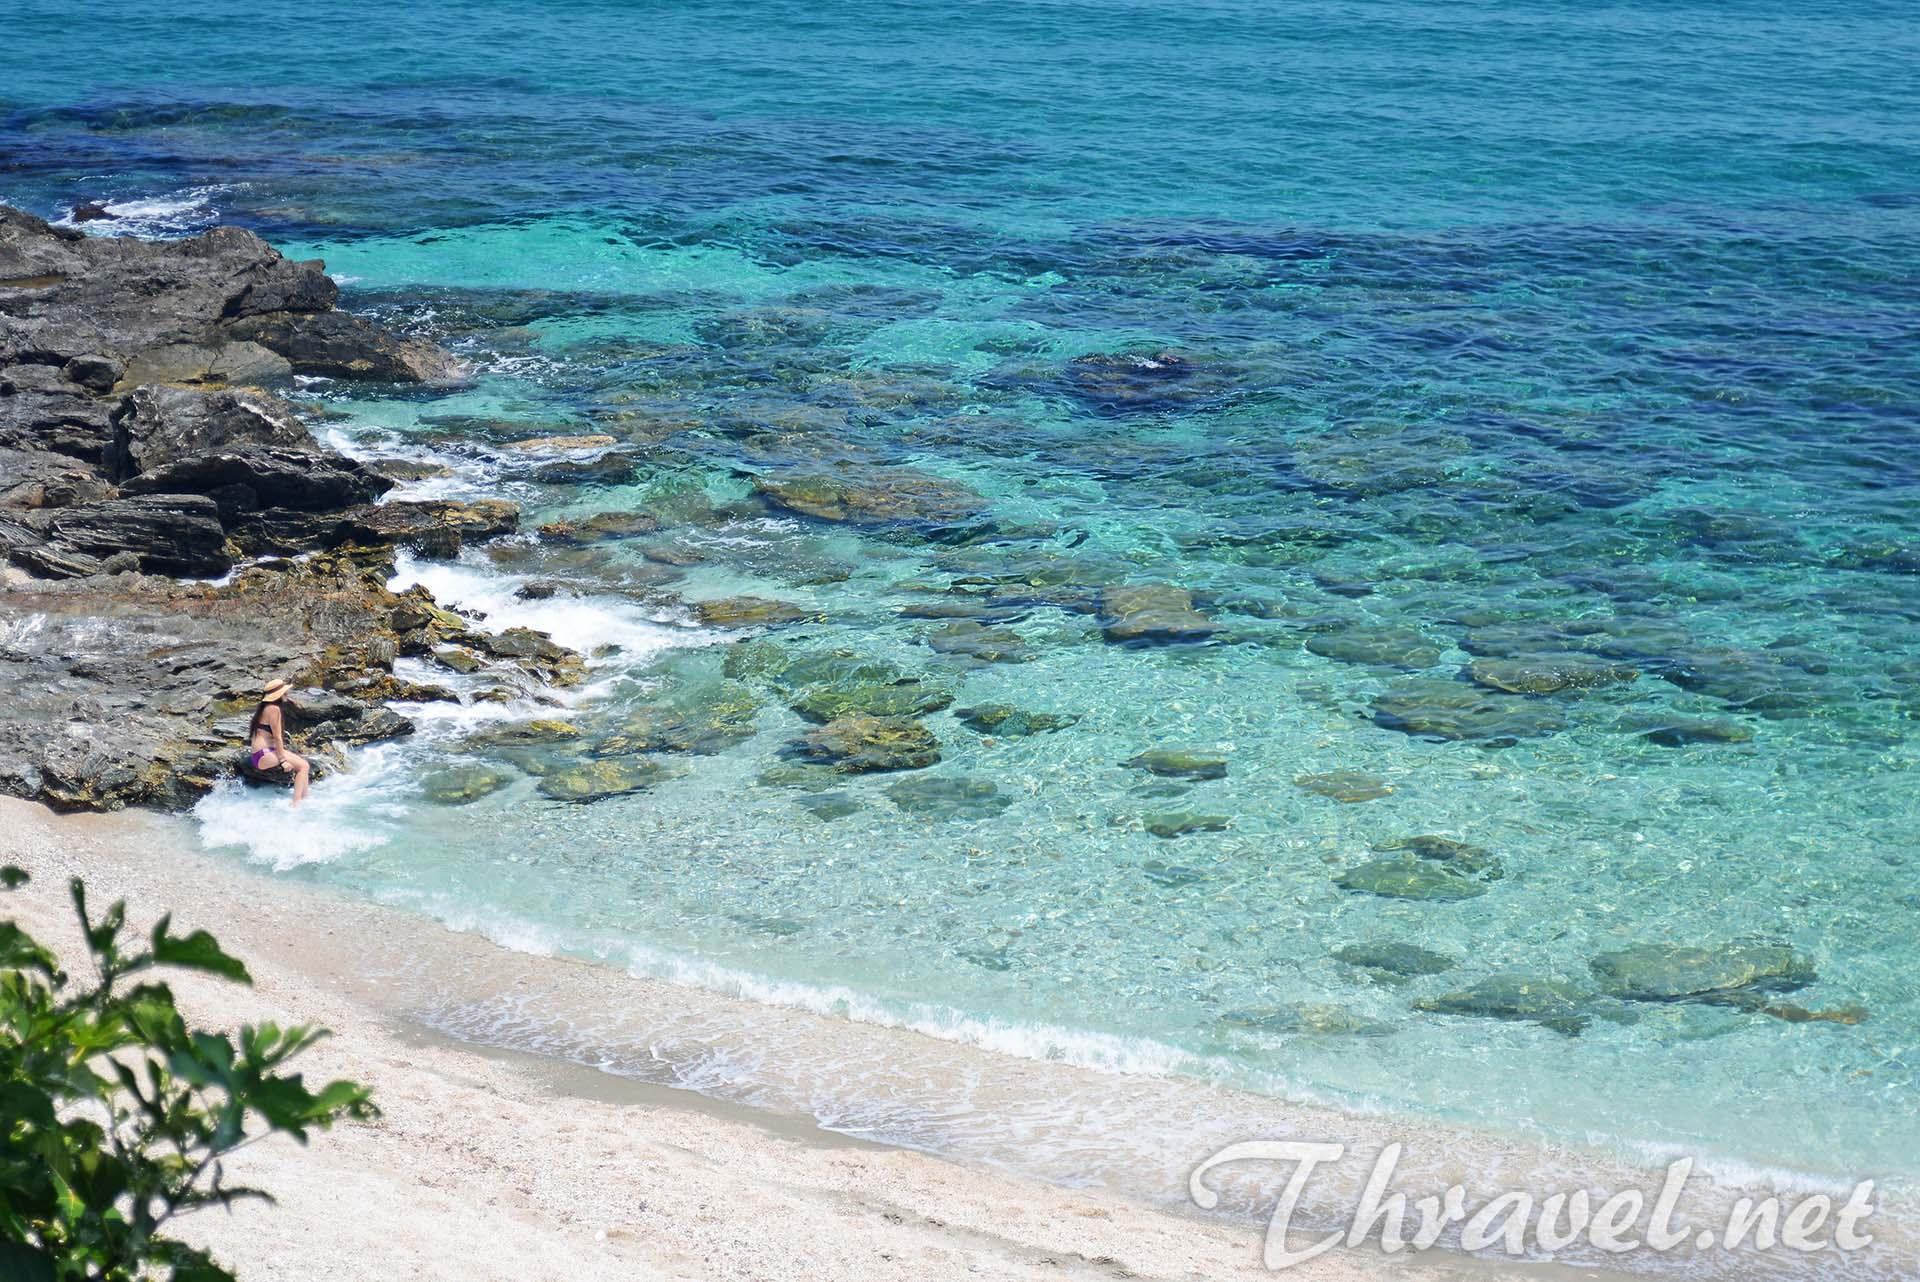 plaka-beach-greece